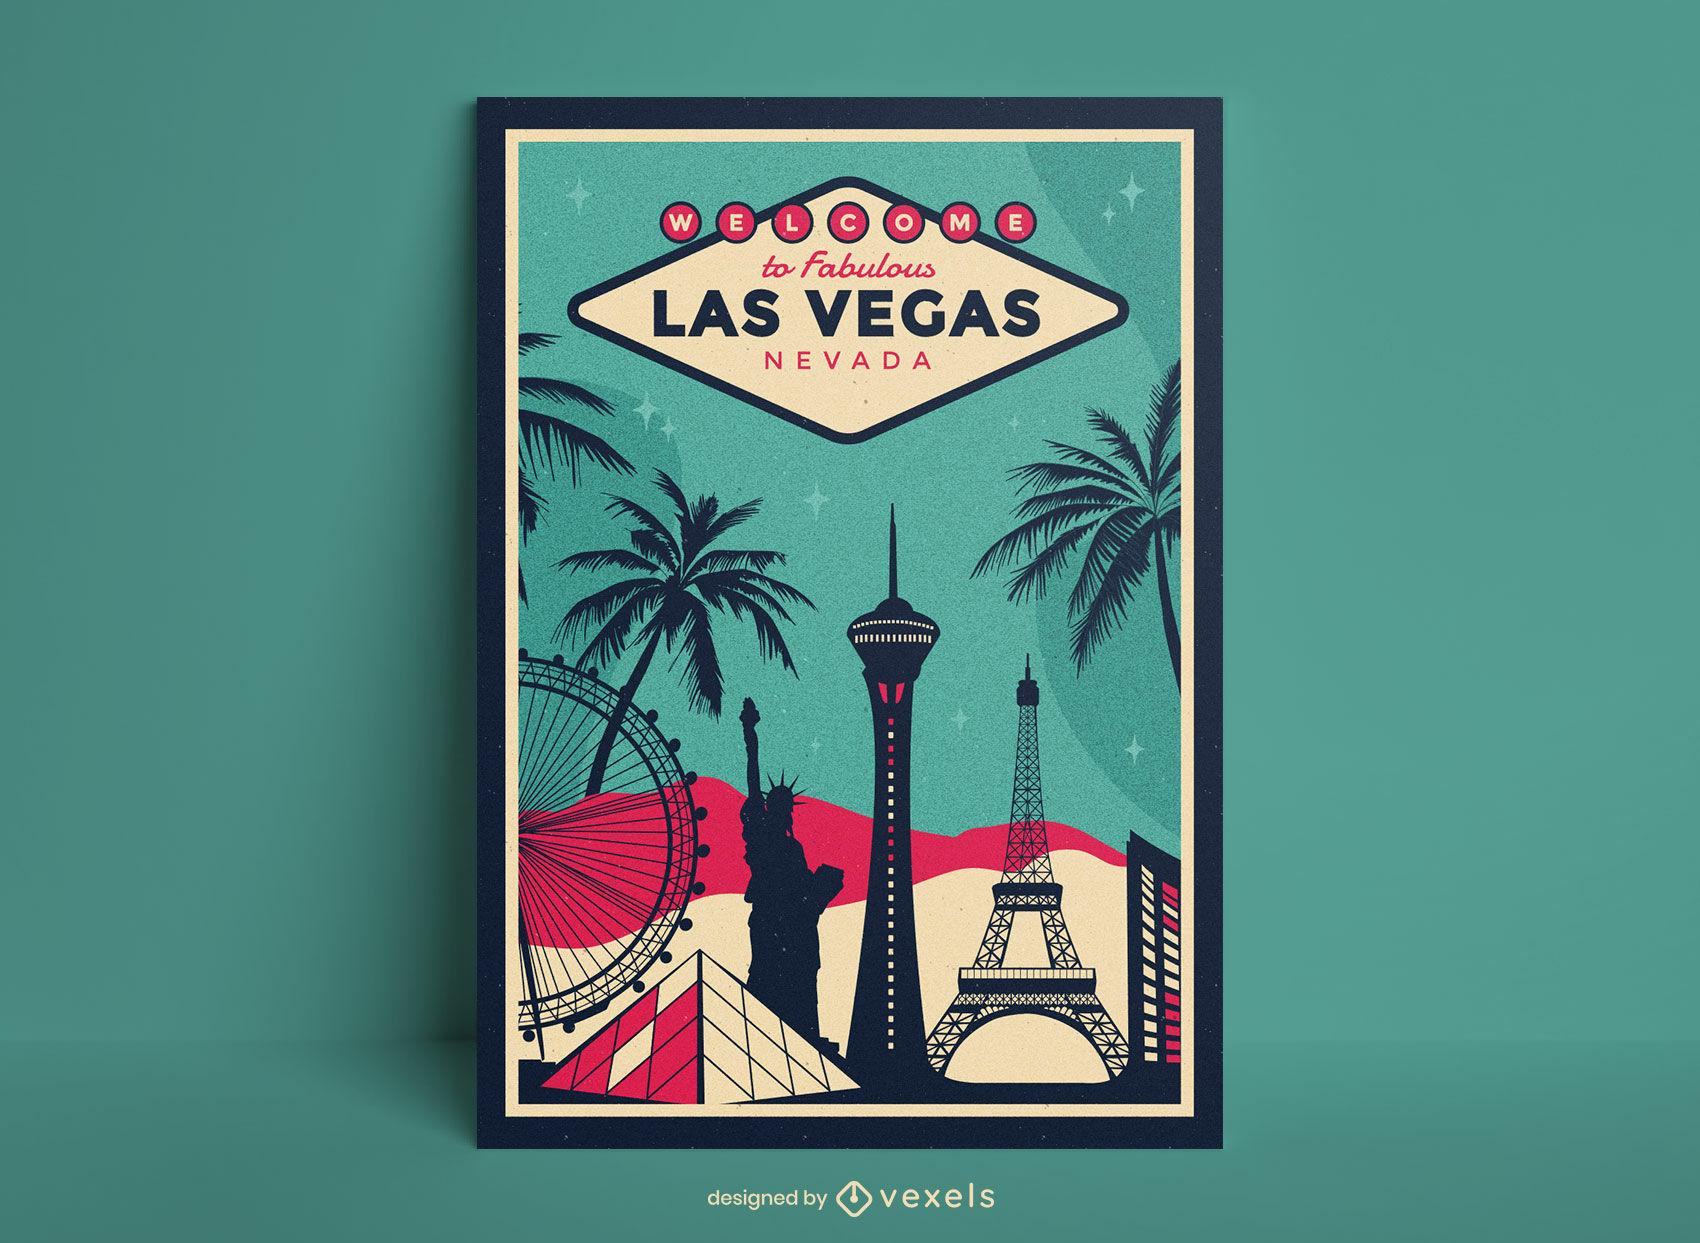 Las vegas city travel poster design